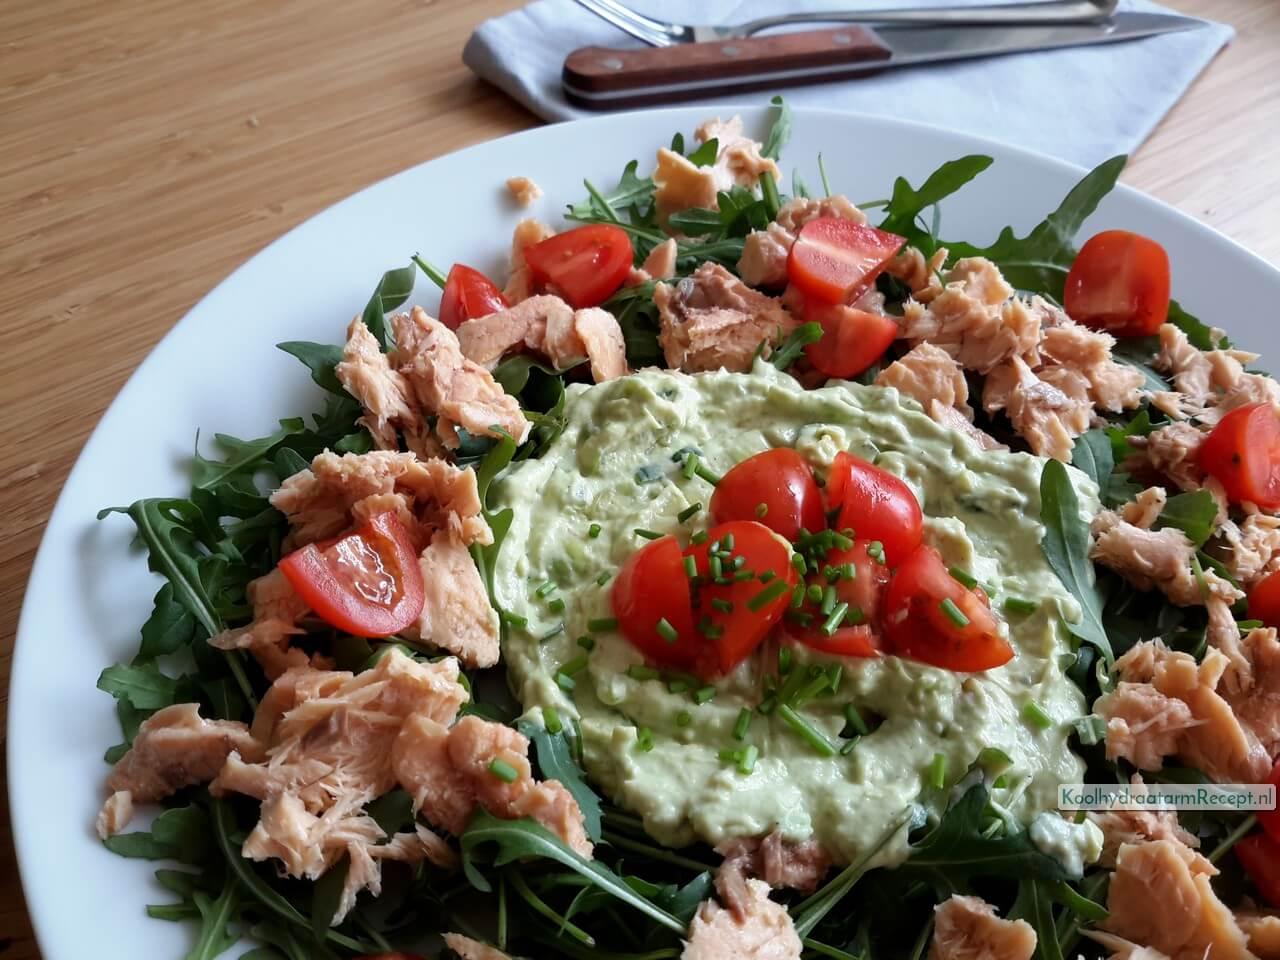 Rucola salade met zalm, avocado en tomaat